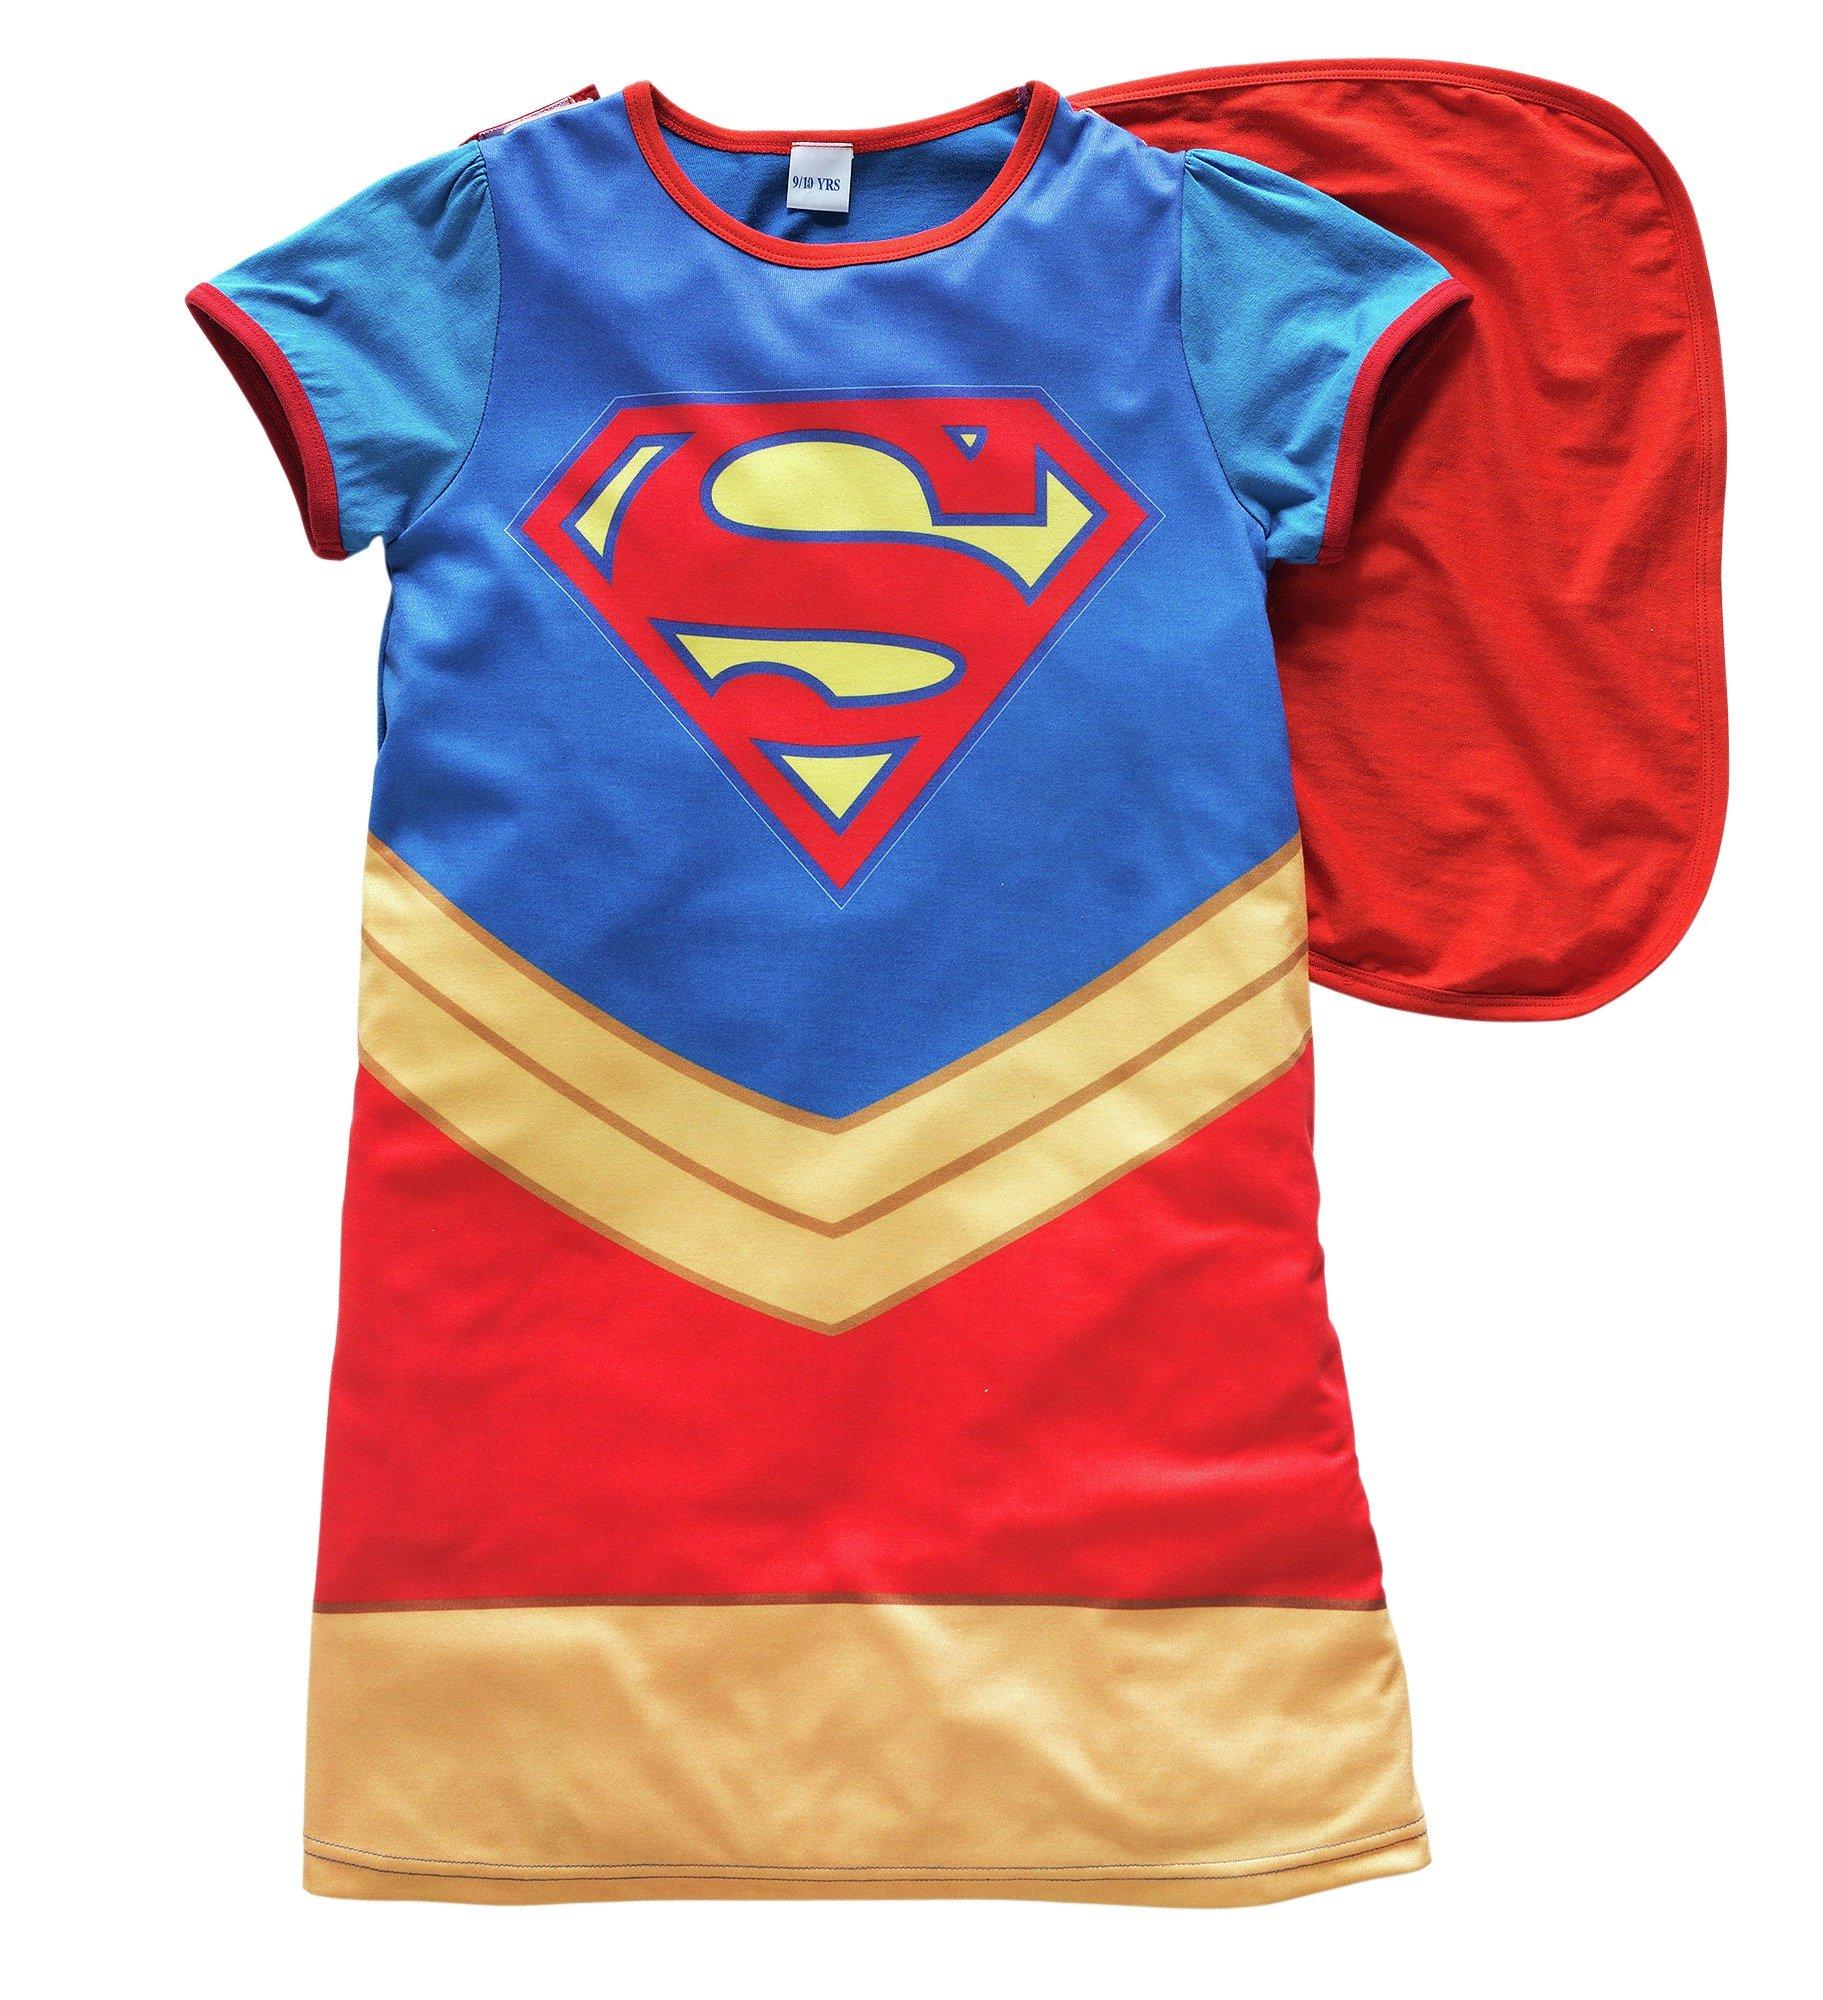 Image of DC Supergirl Nightie - 9-10 Years